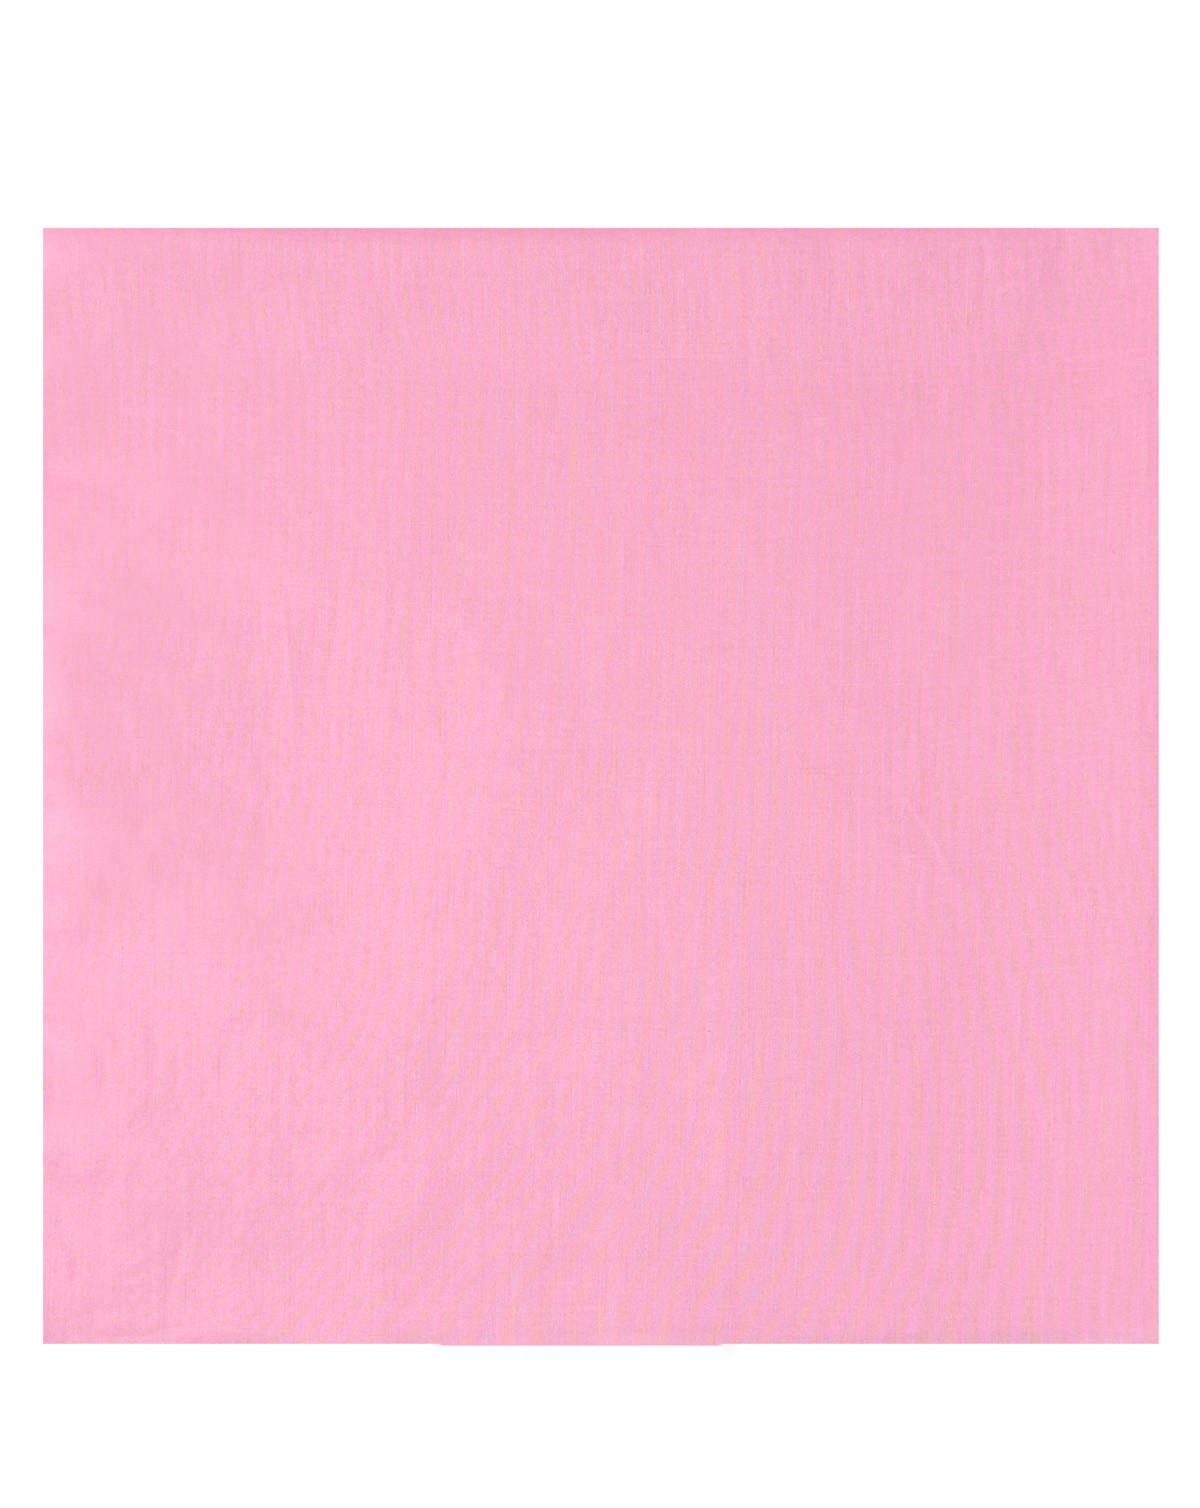 Image of   Rothco Bandana 5 (Pink, One Size)